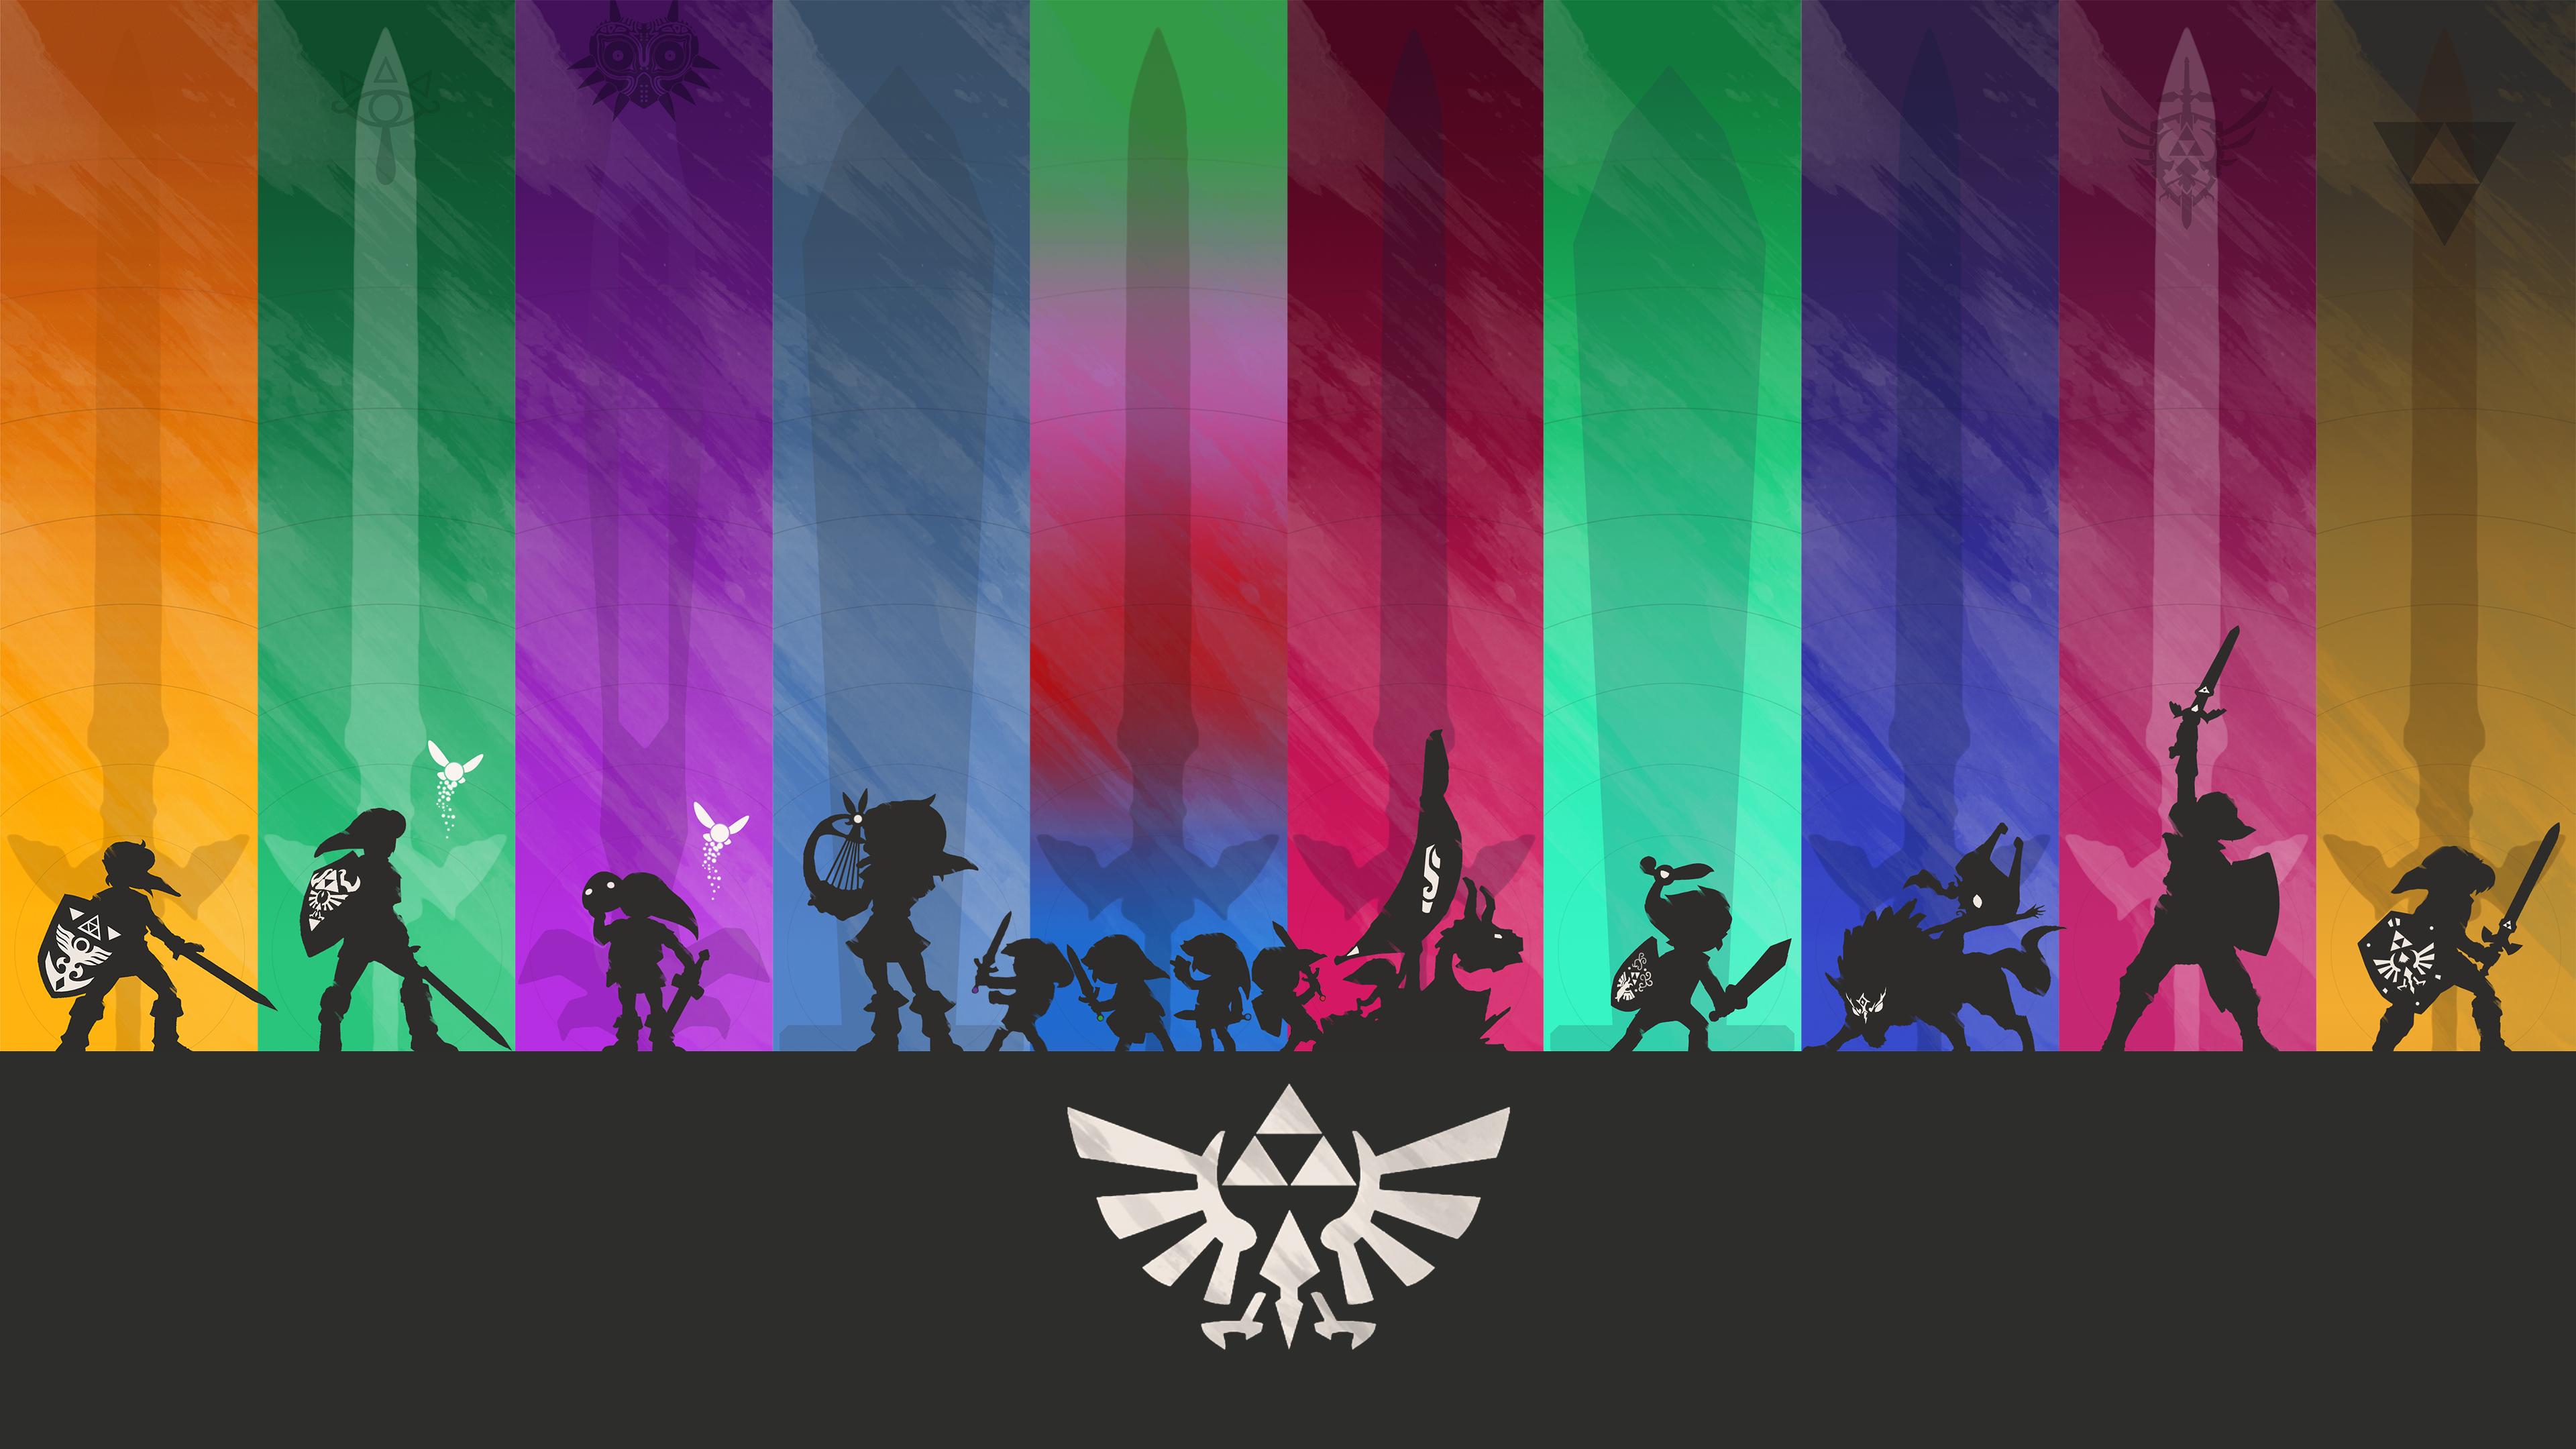 Minimalistic Legend Of Zelda Wallpaper 4k By Henrikpw On Deviantart